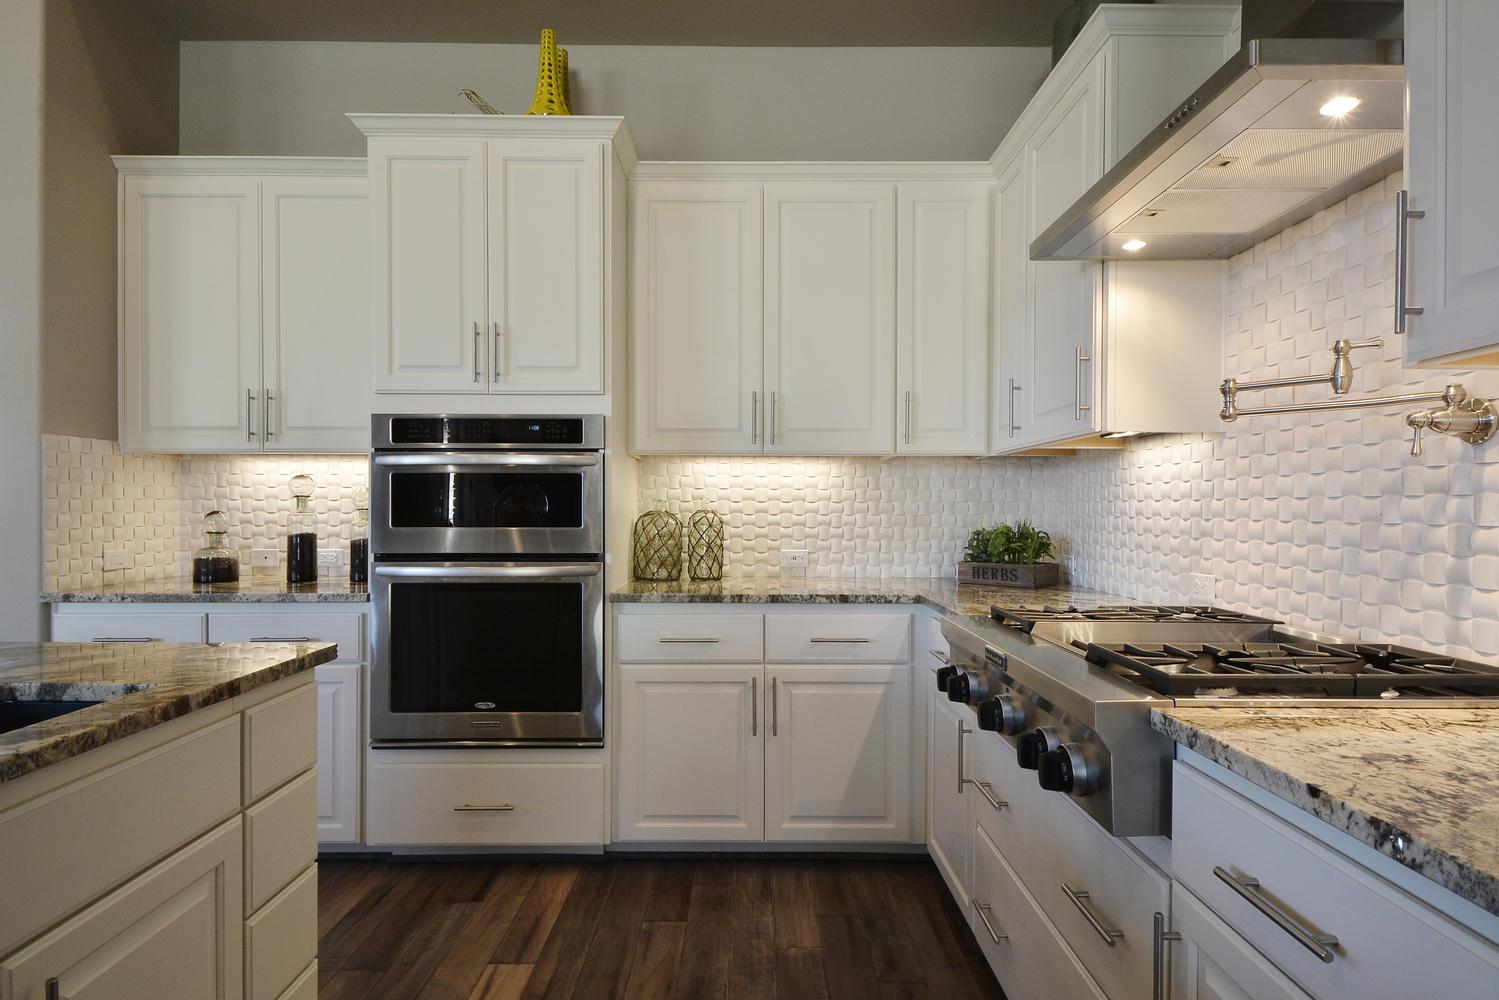 Burrows Cabinets Bone white kitchen with white subway tile